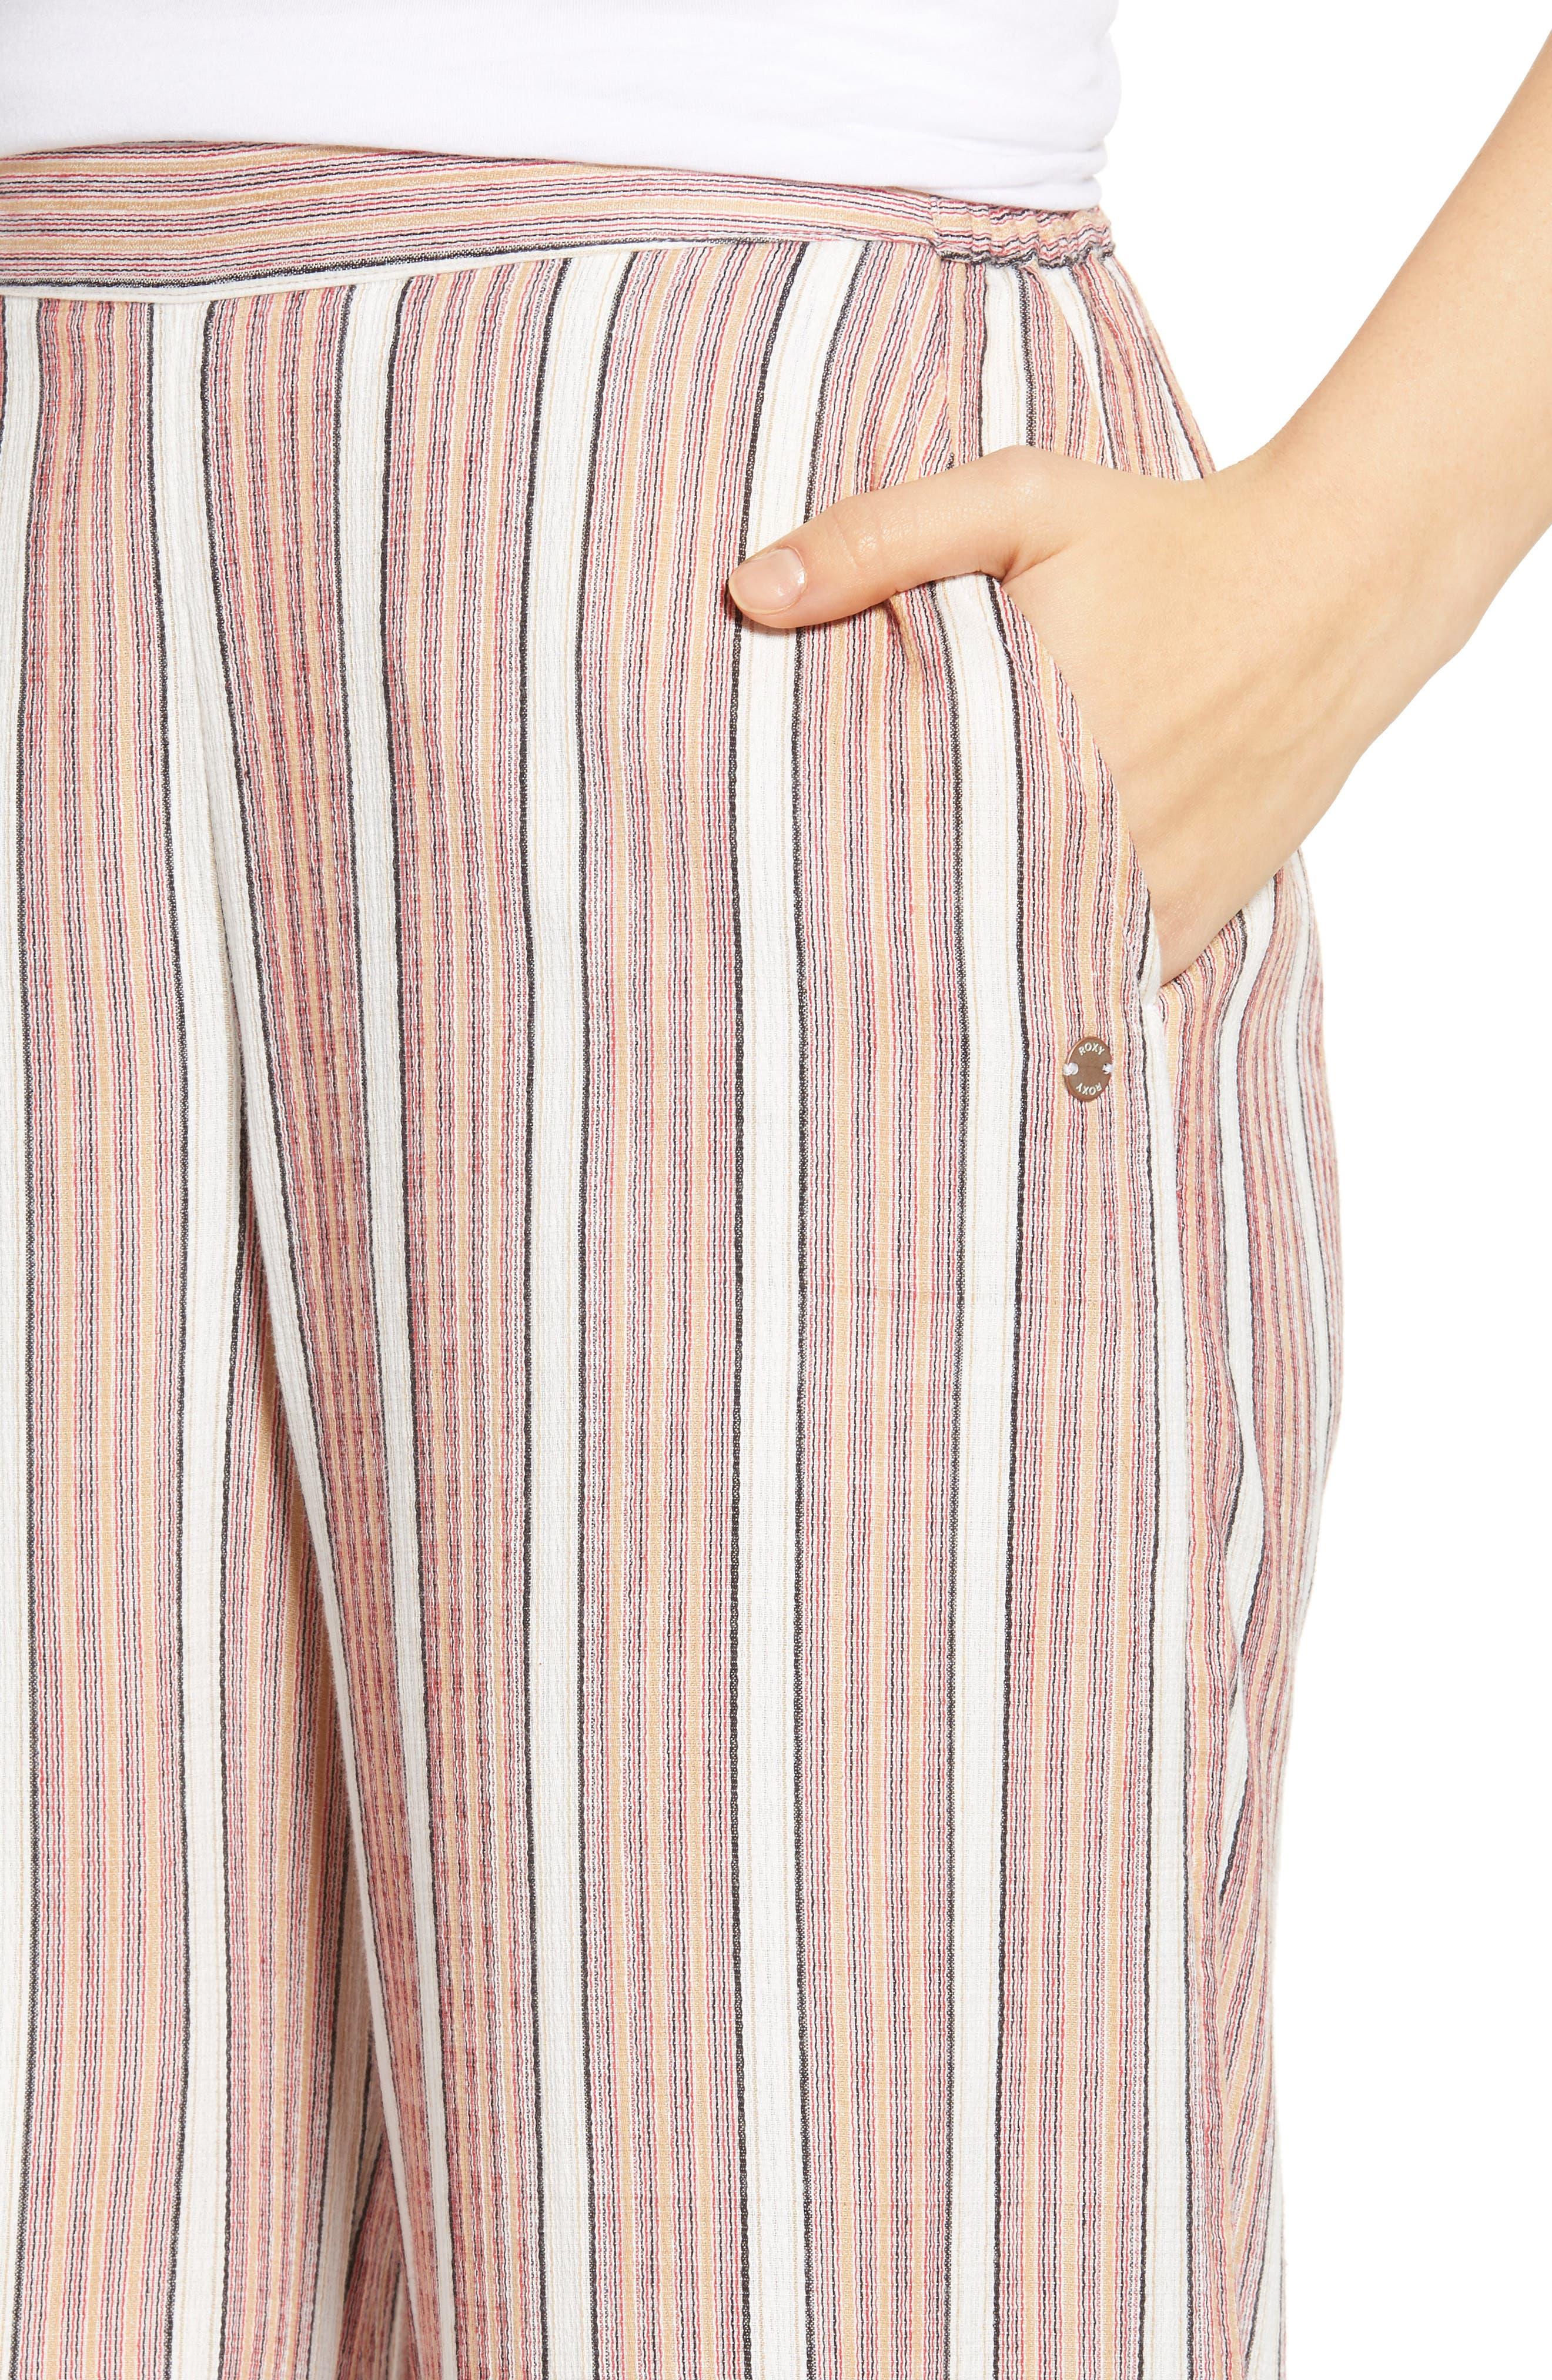 Midnight Avenue Stripe Pants,                             Alternate thumbnail 4, color,                             AMERICAN BEAUTY MULTI STRIPES